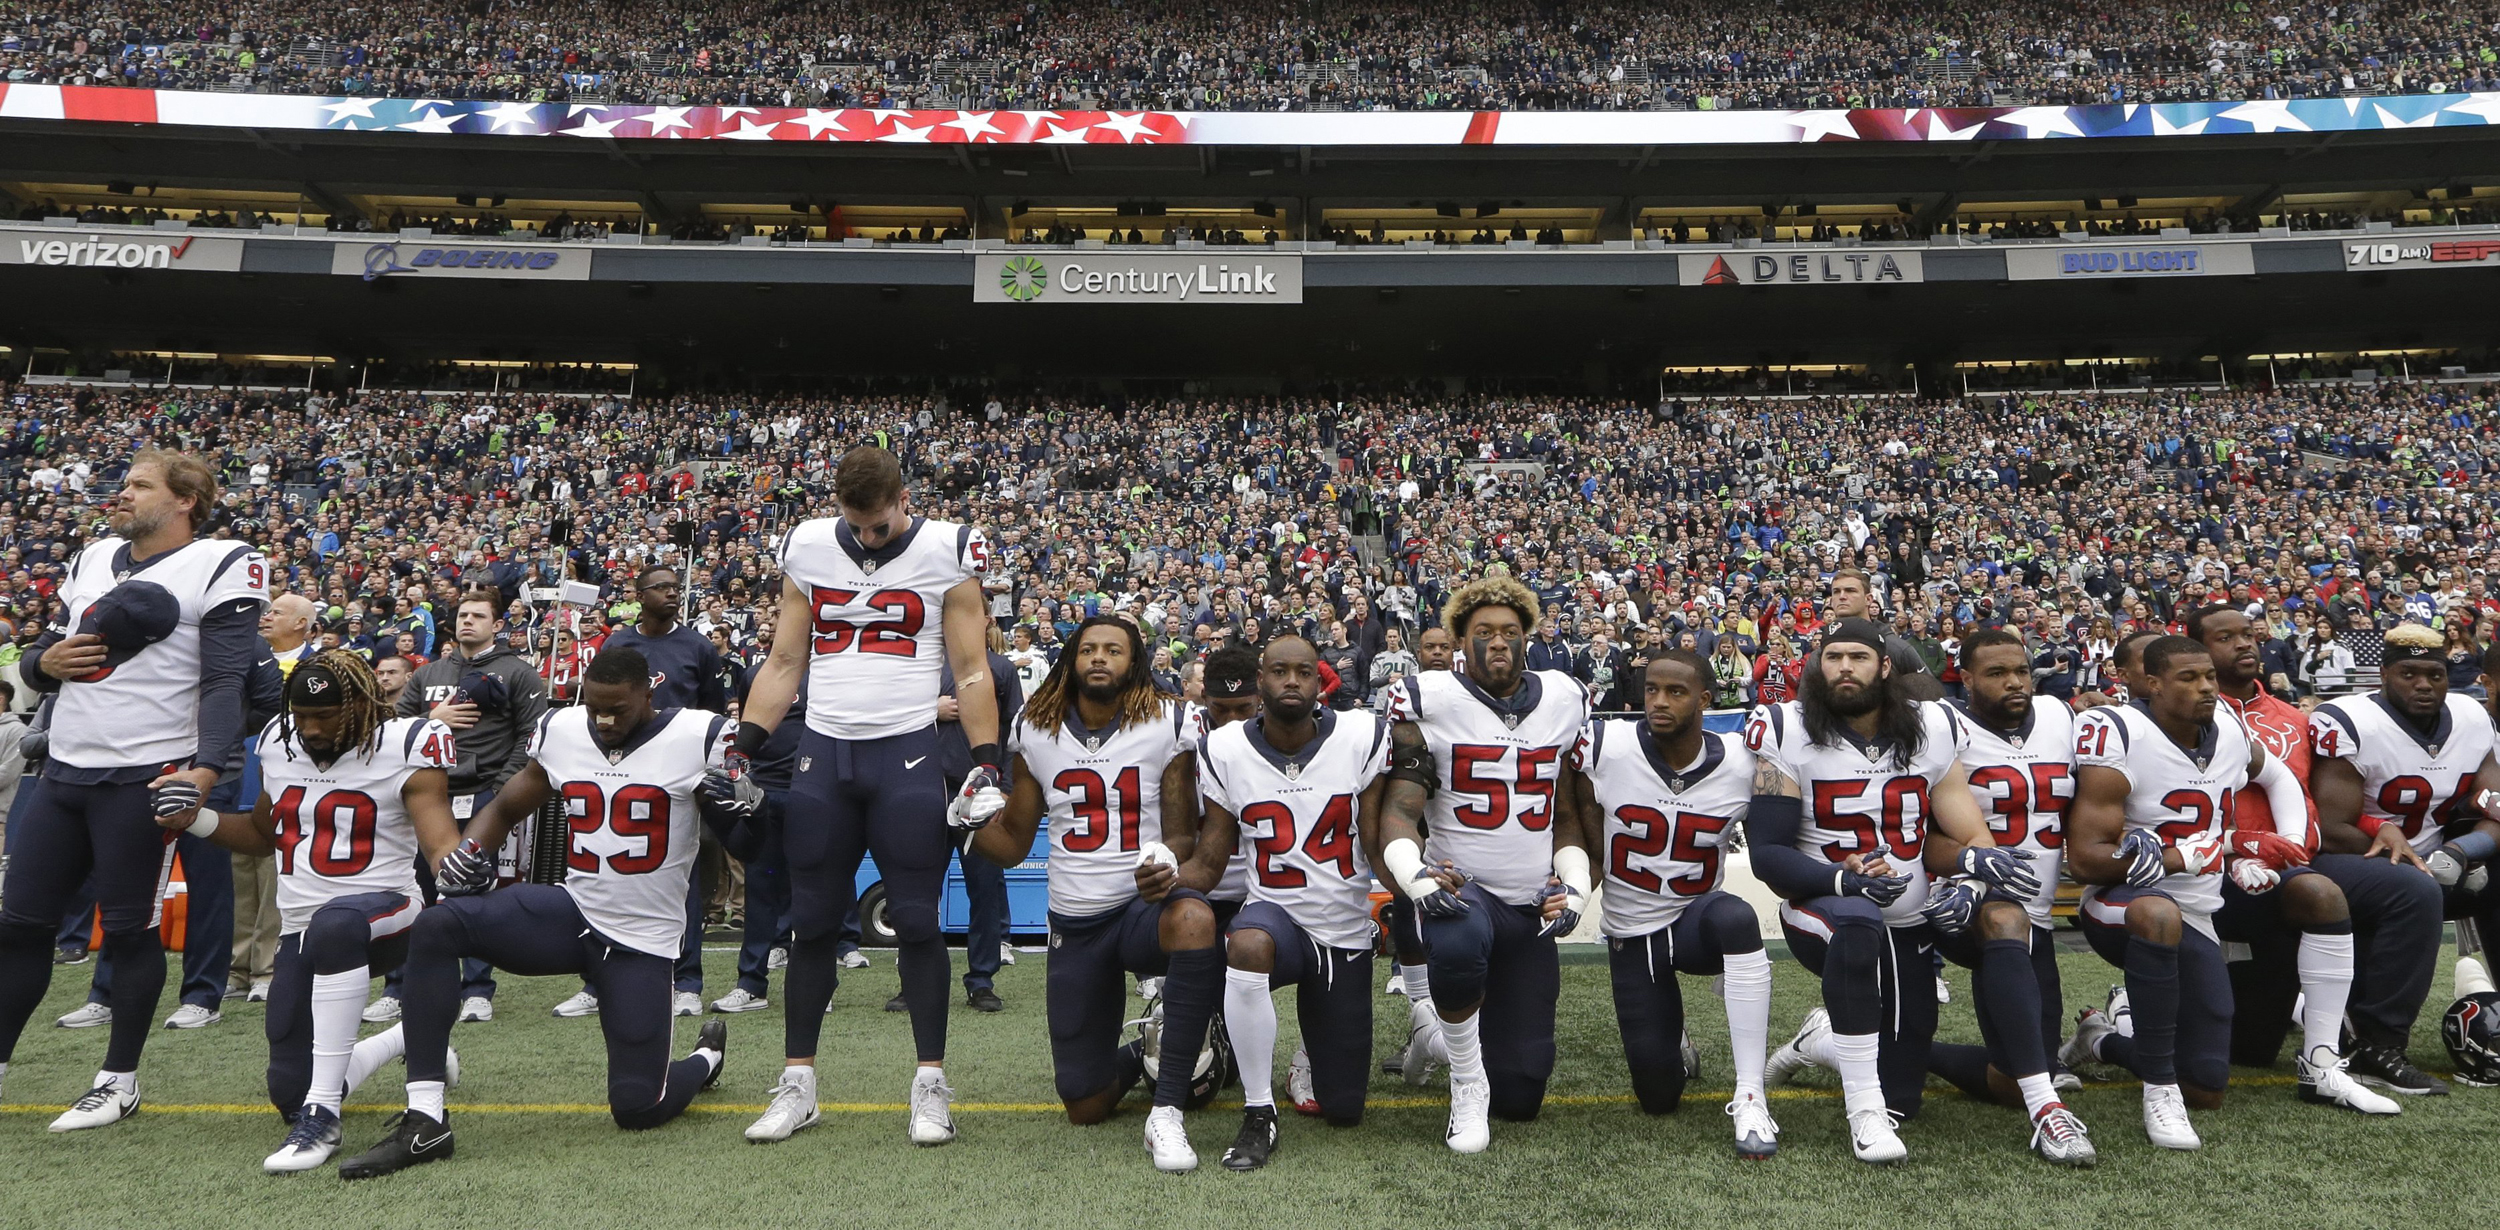 Image: NFL Players Kneel